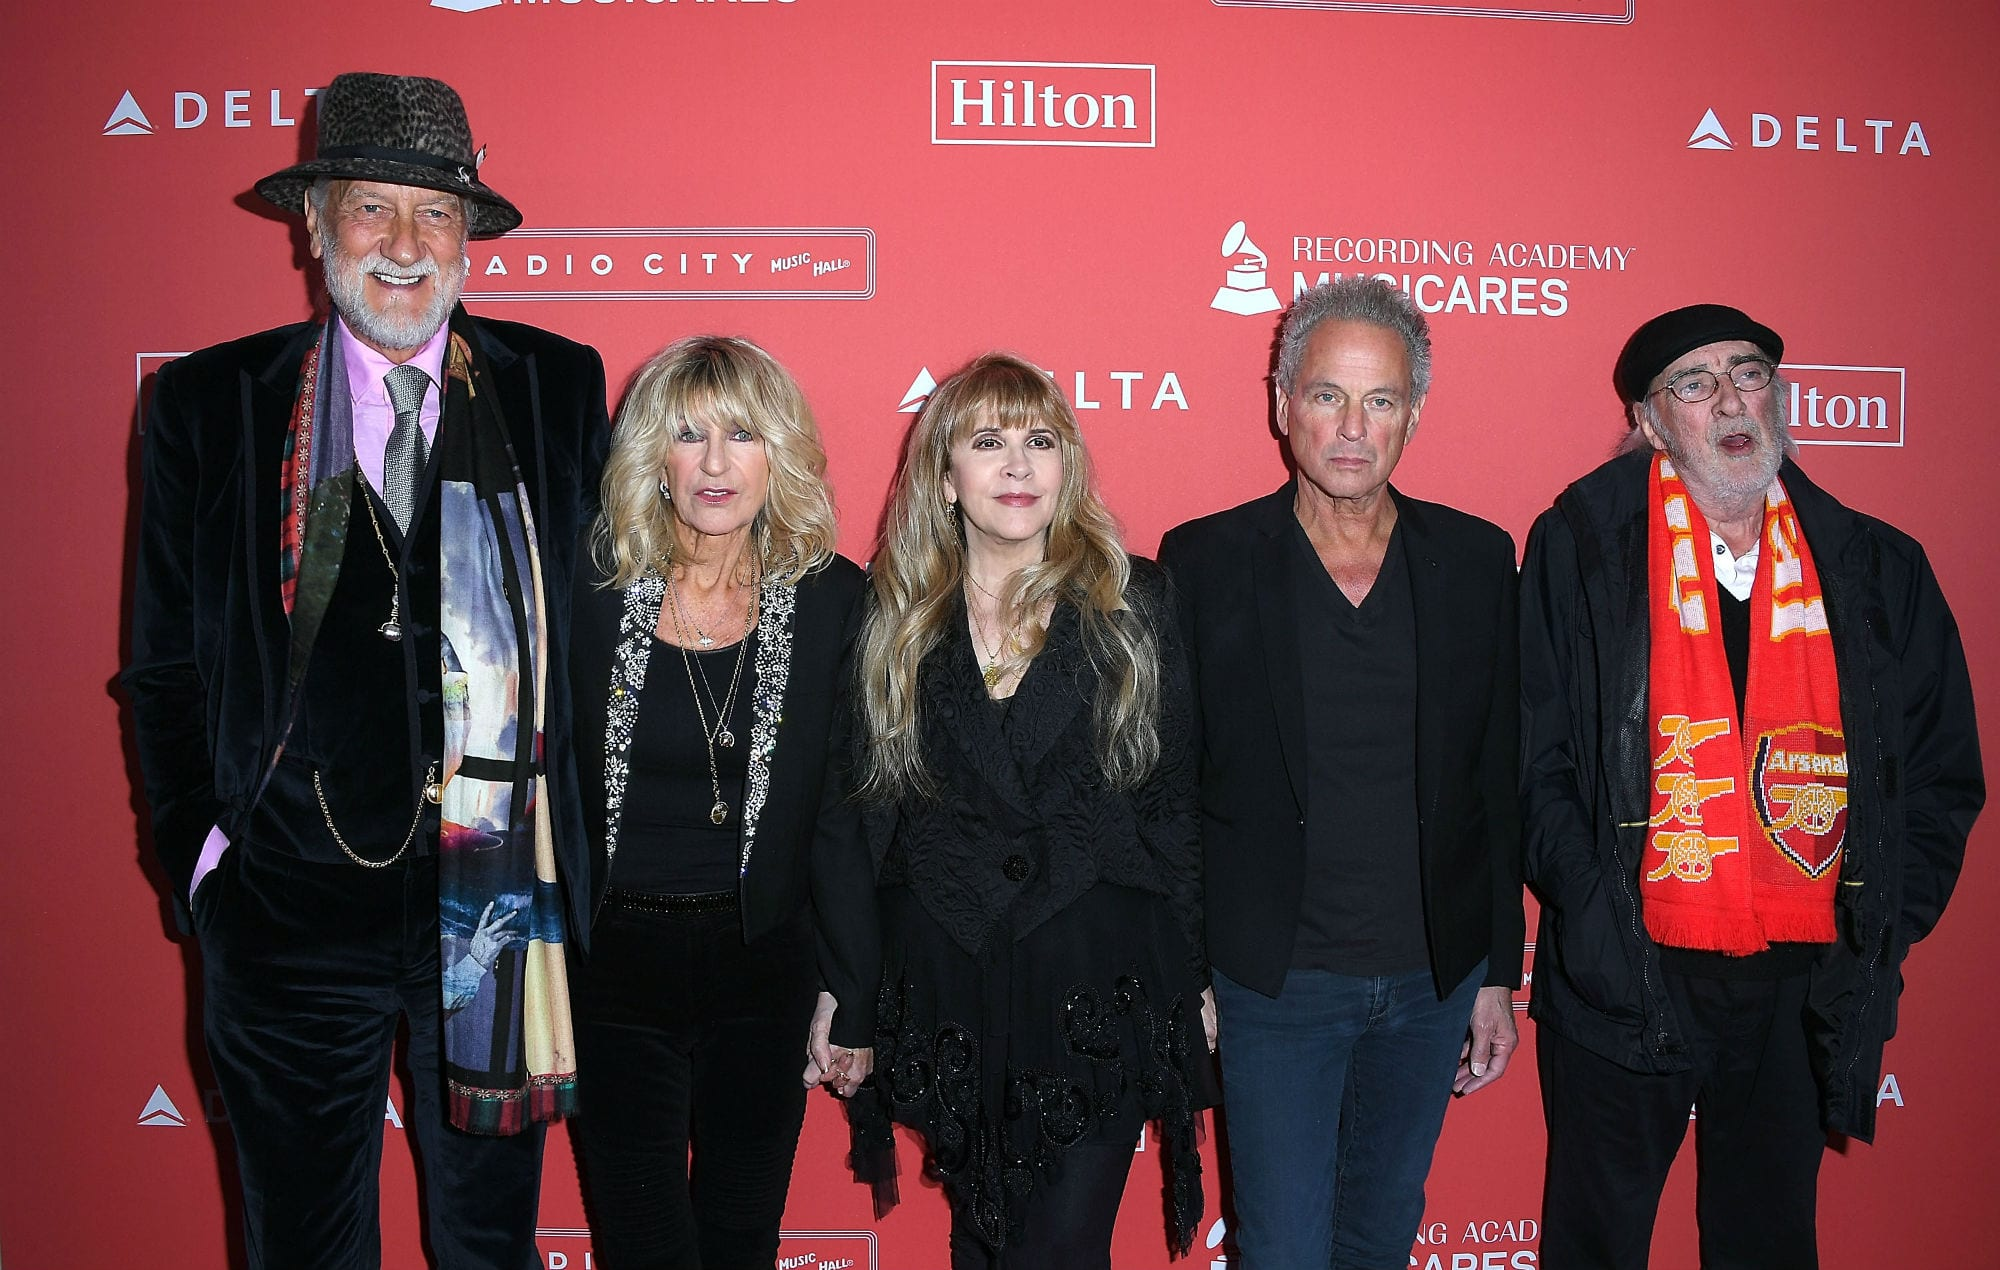 Why Did Fleetwood Mac Break Up?